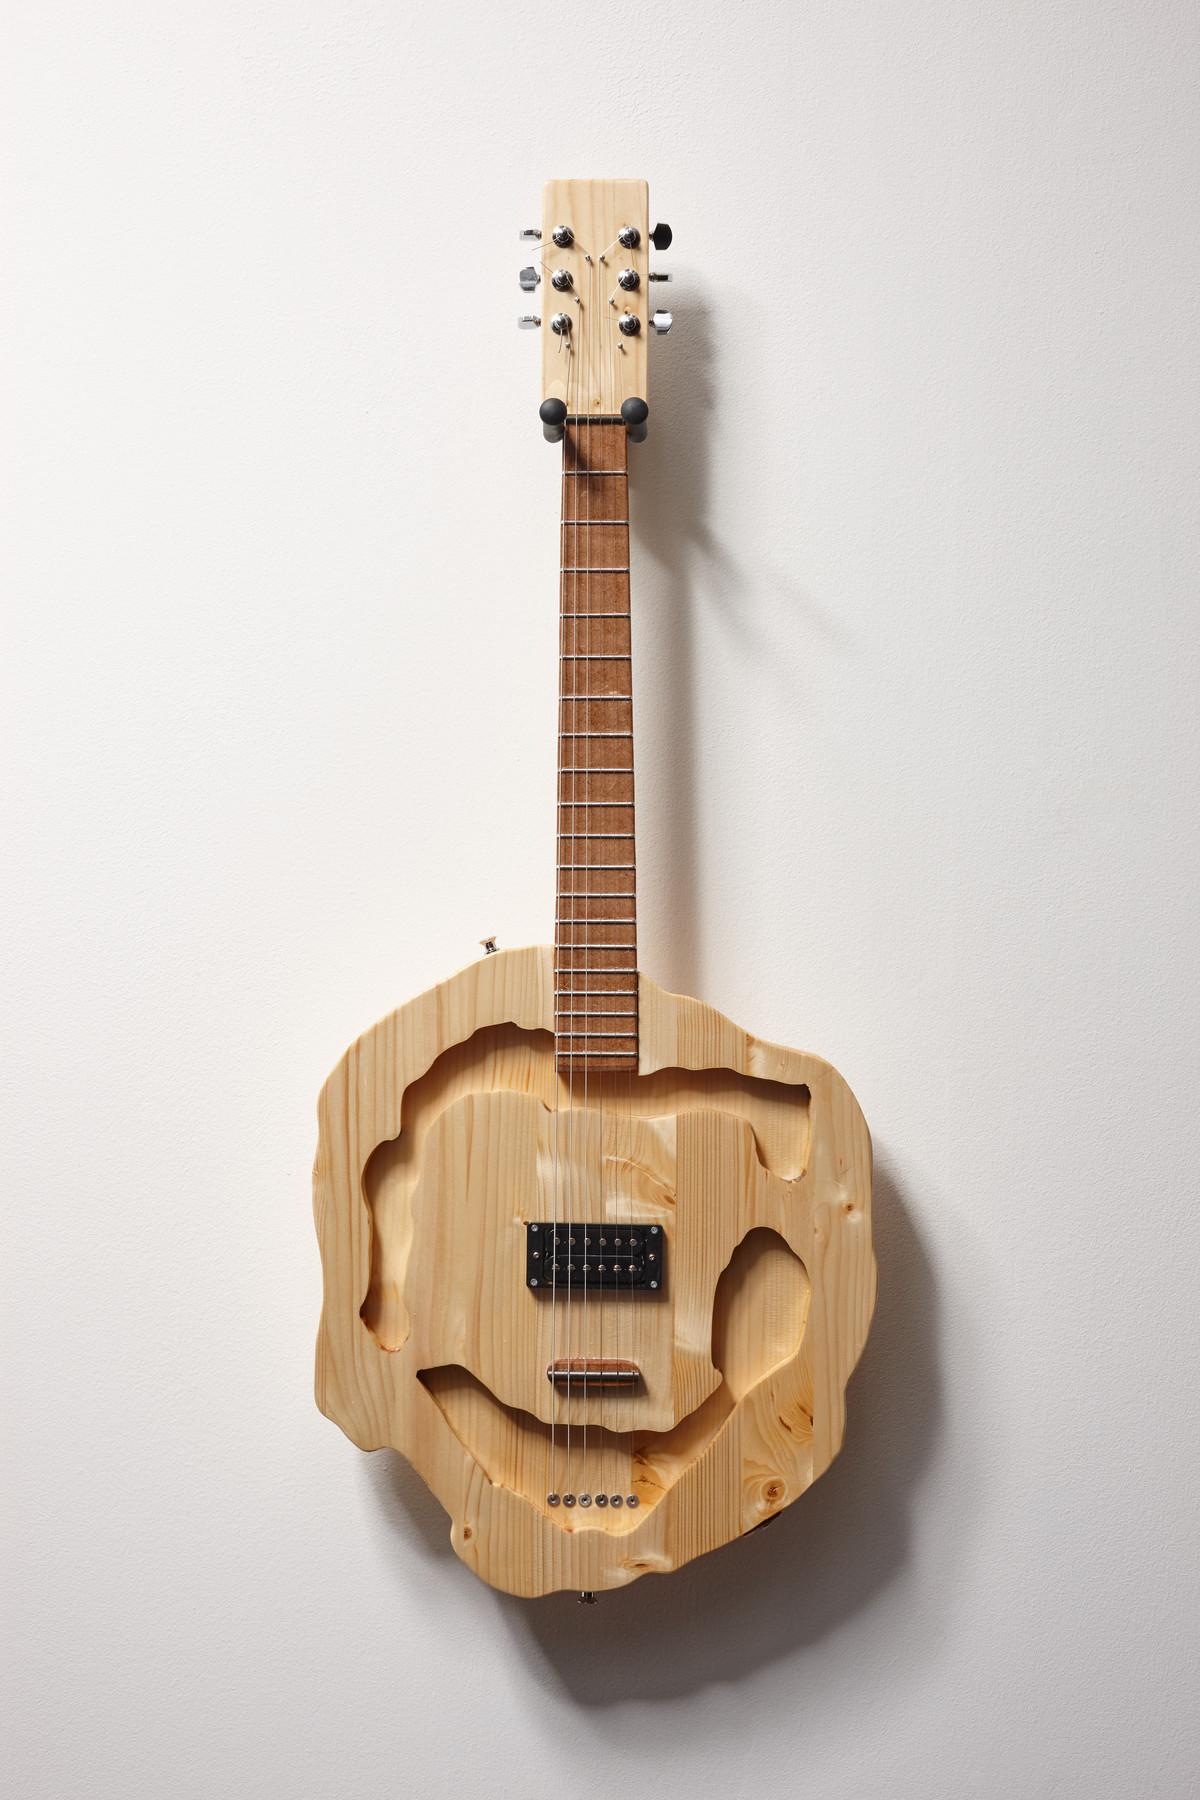 Flavio Merlo - Guitar II, 2015